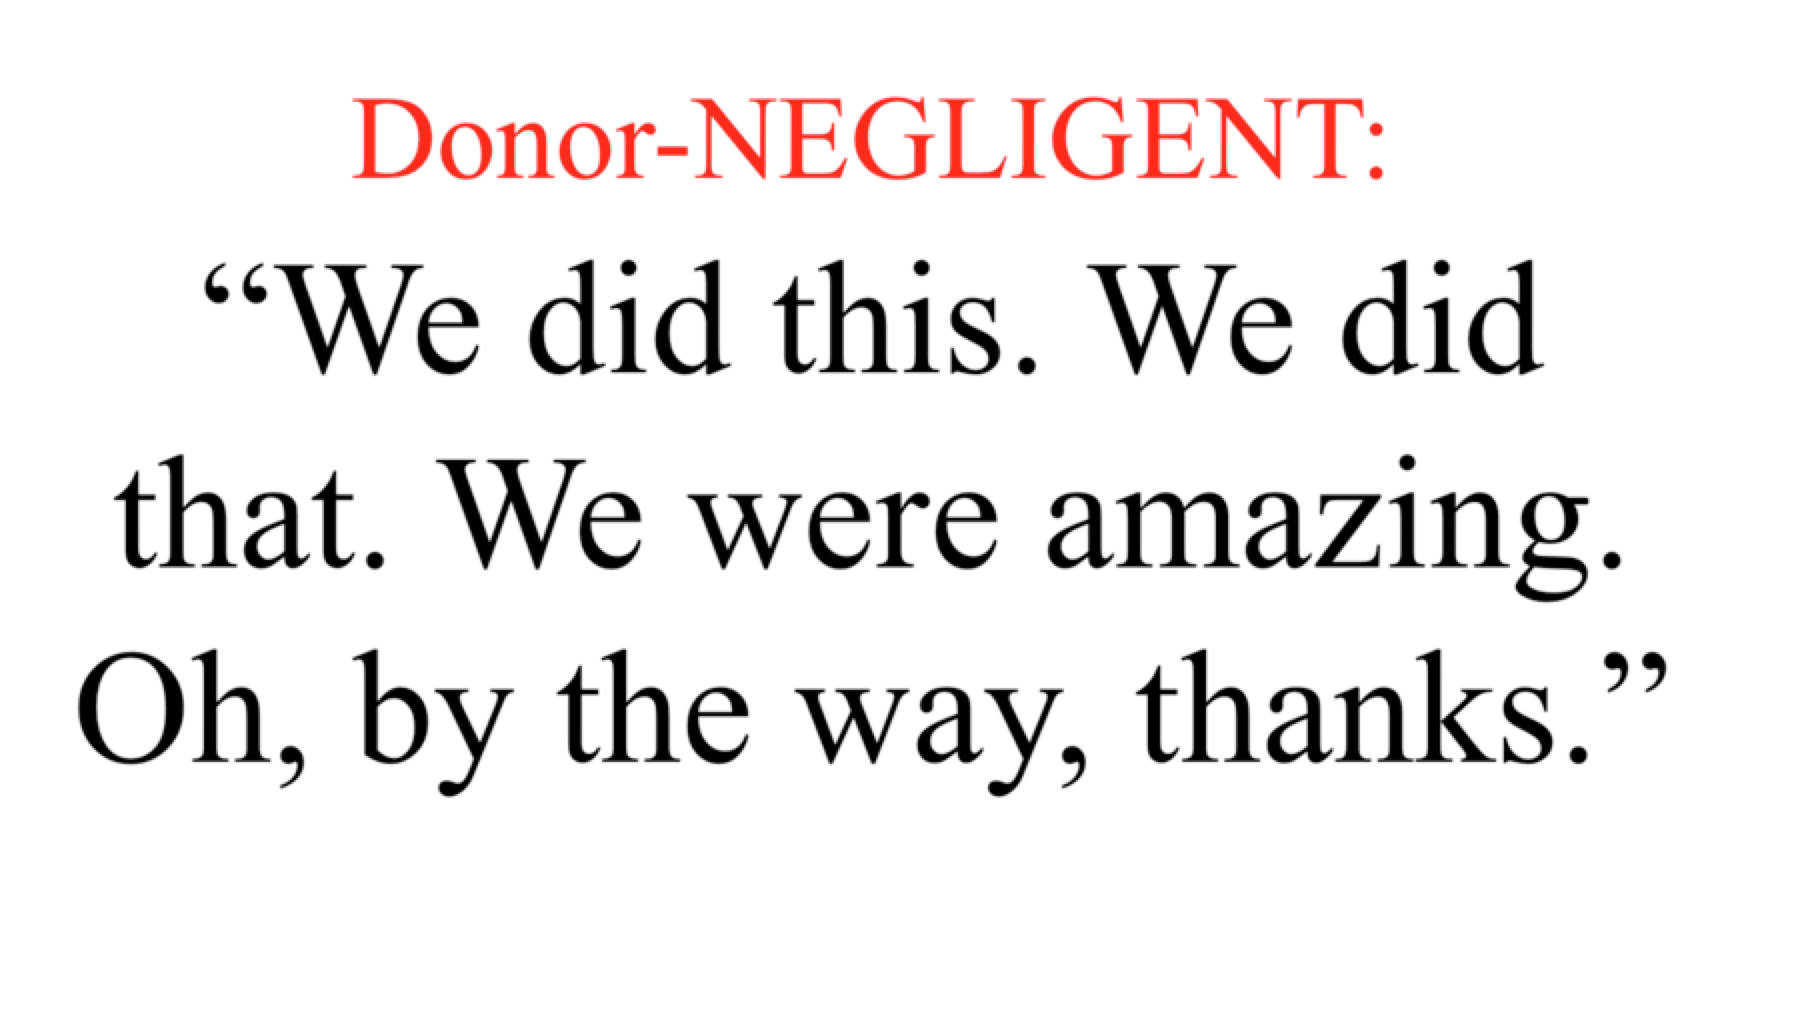 donor-negligent